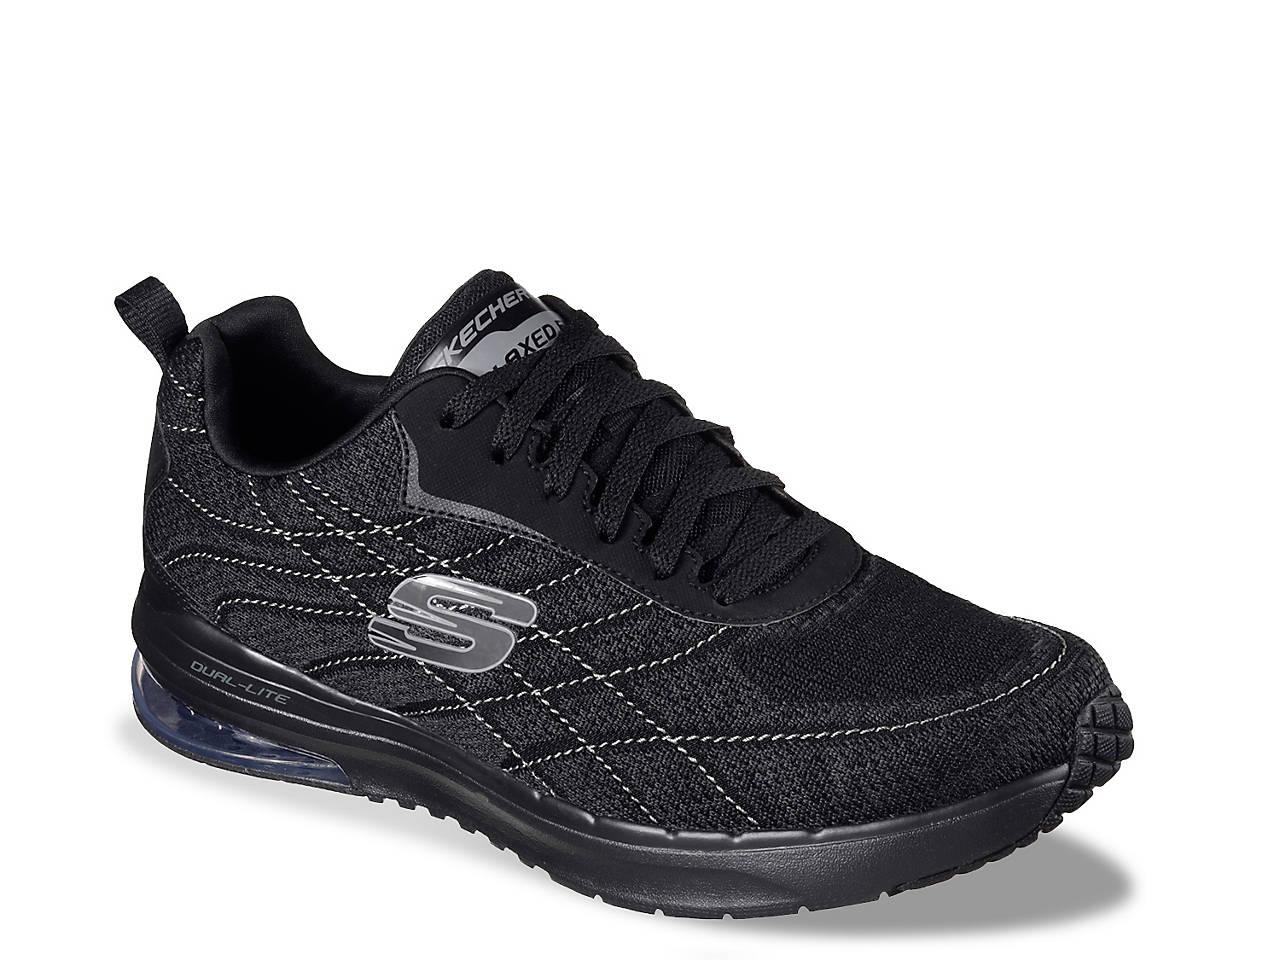 Som Skechers Skech Air Infinity Belden Charcoalred Ankle if4Ew